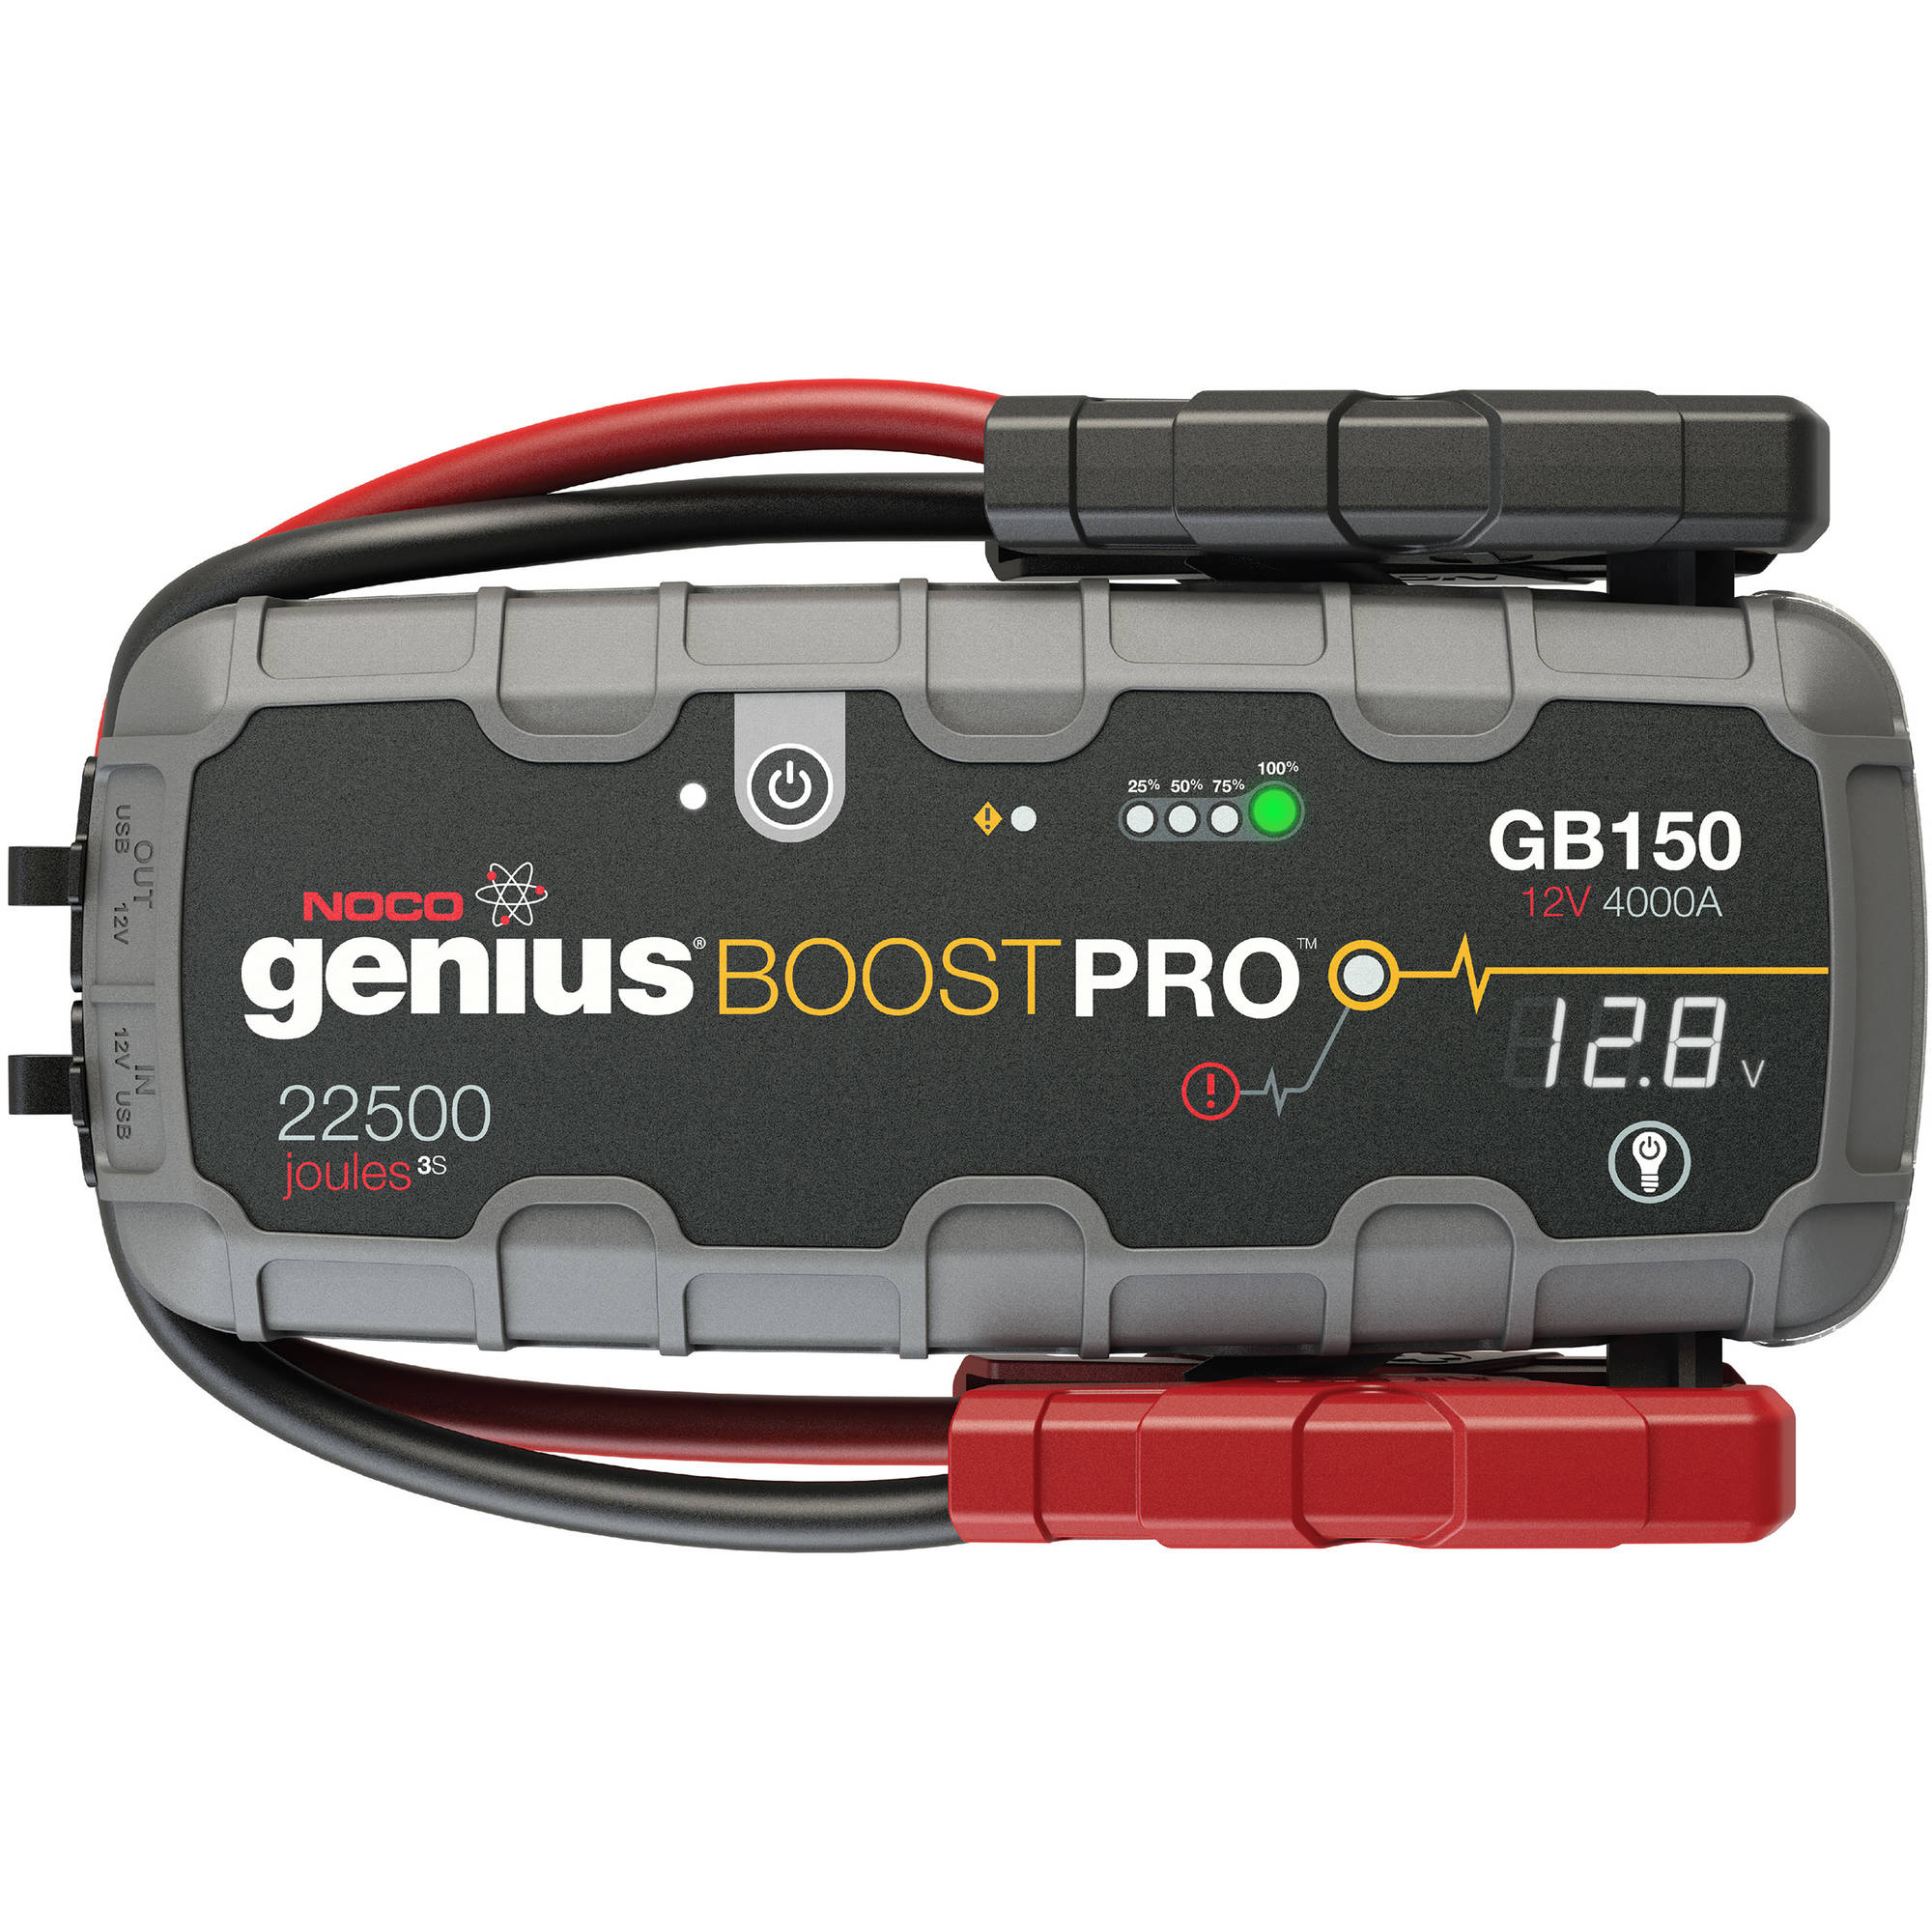 NOCO Genius Boost Pro GB150 4,000 Amp 12V UltraSafe Lithium Jump Starter